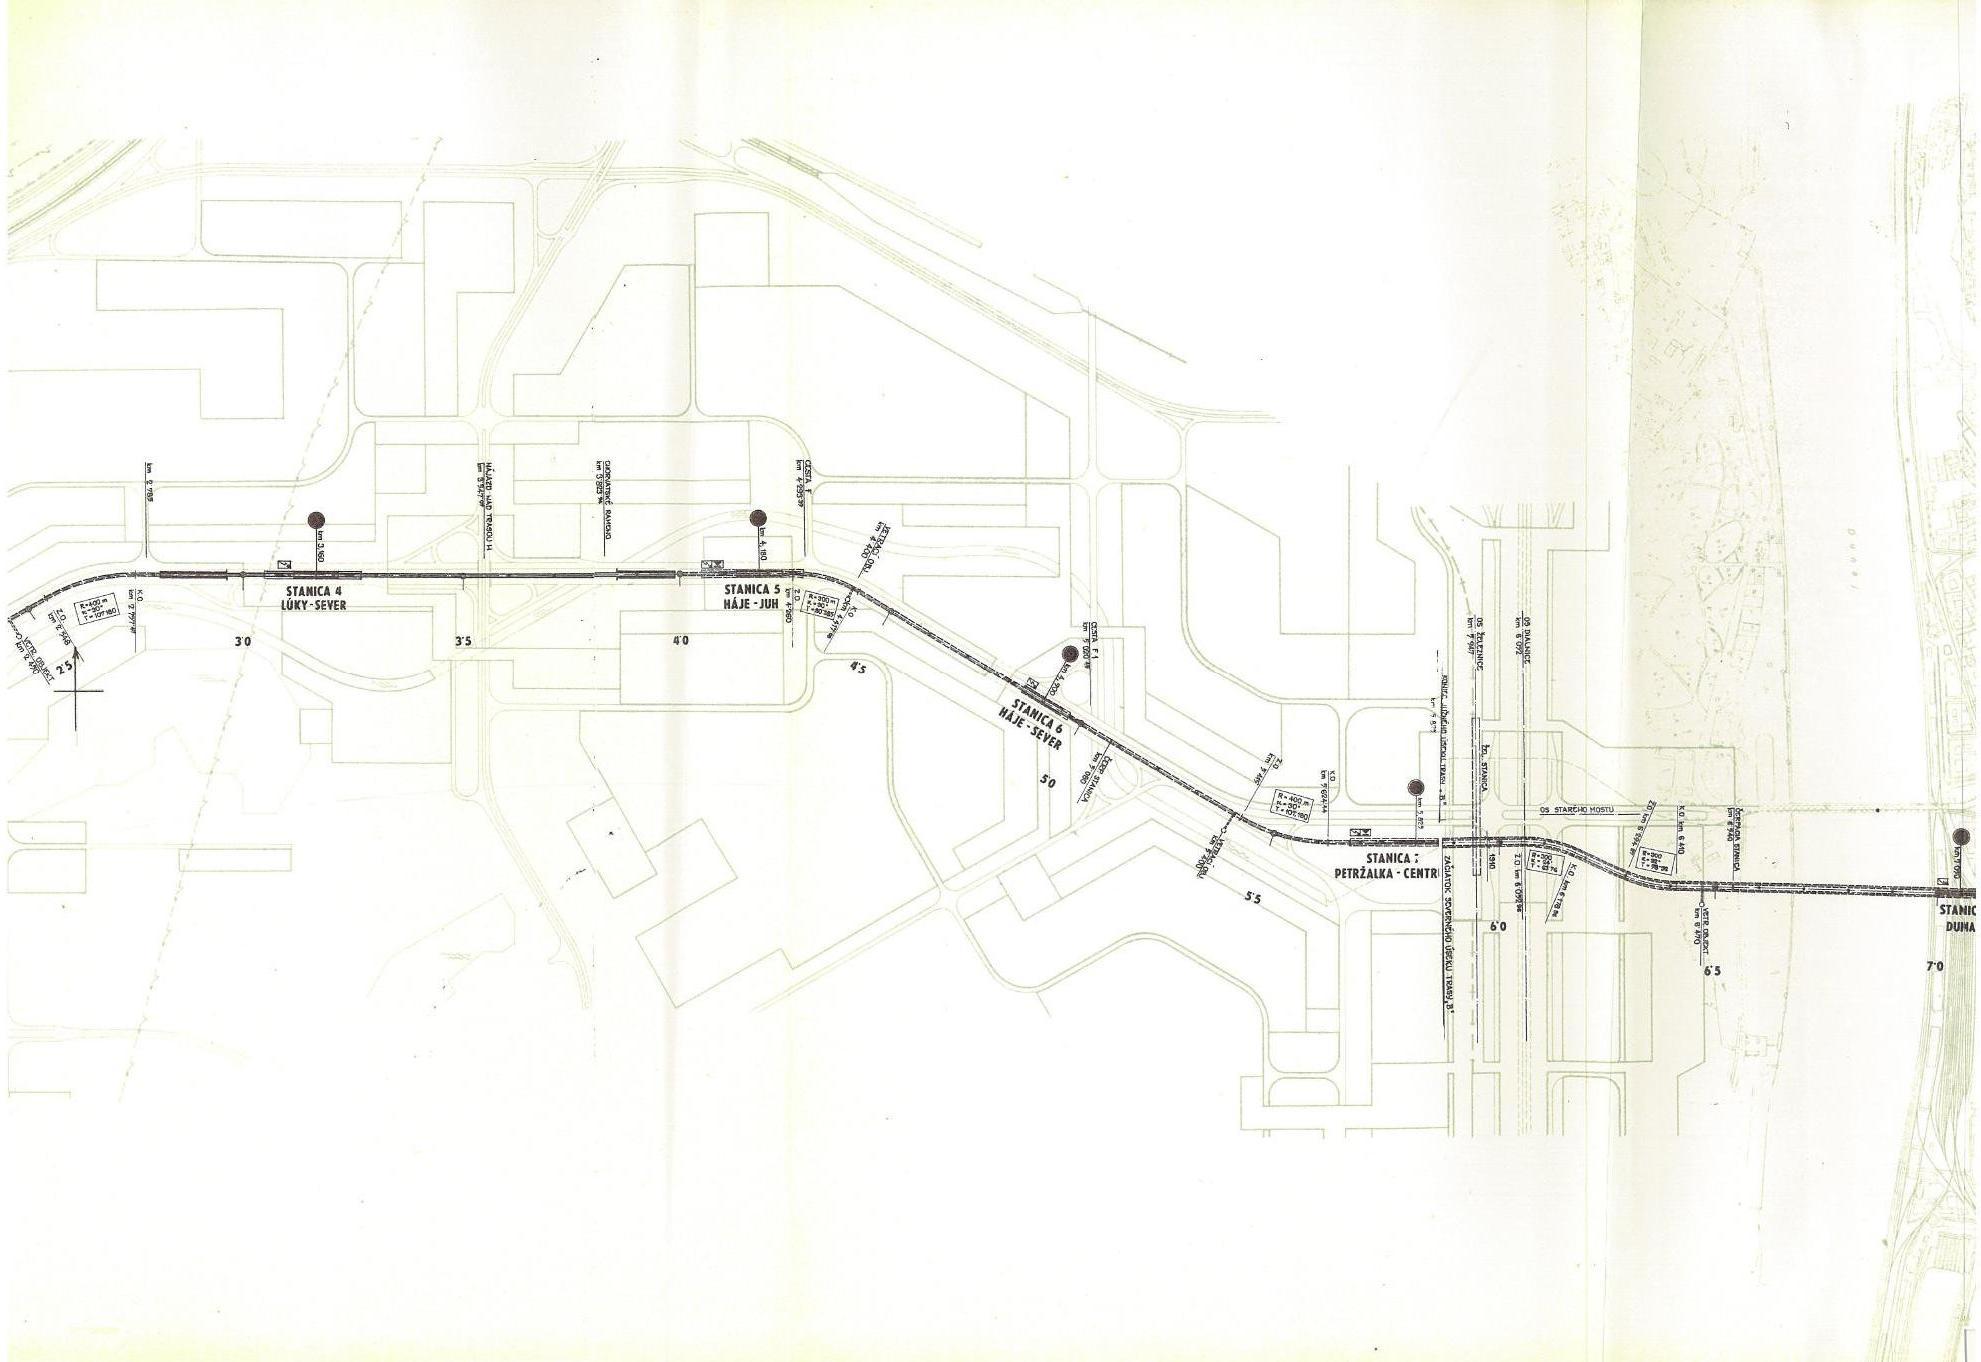 Metro I etapa - trasa 2C 2-3